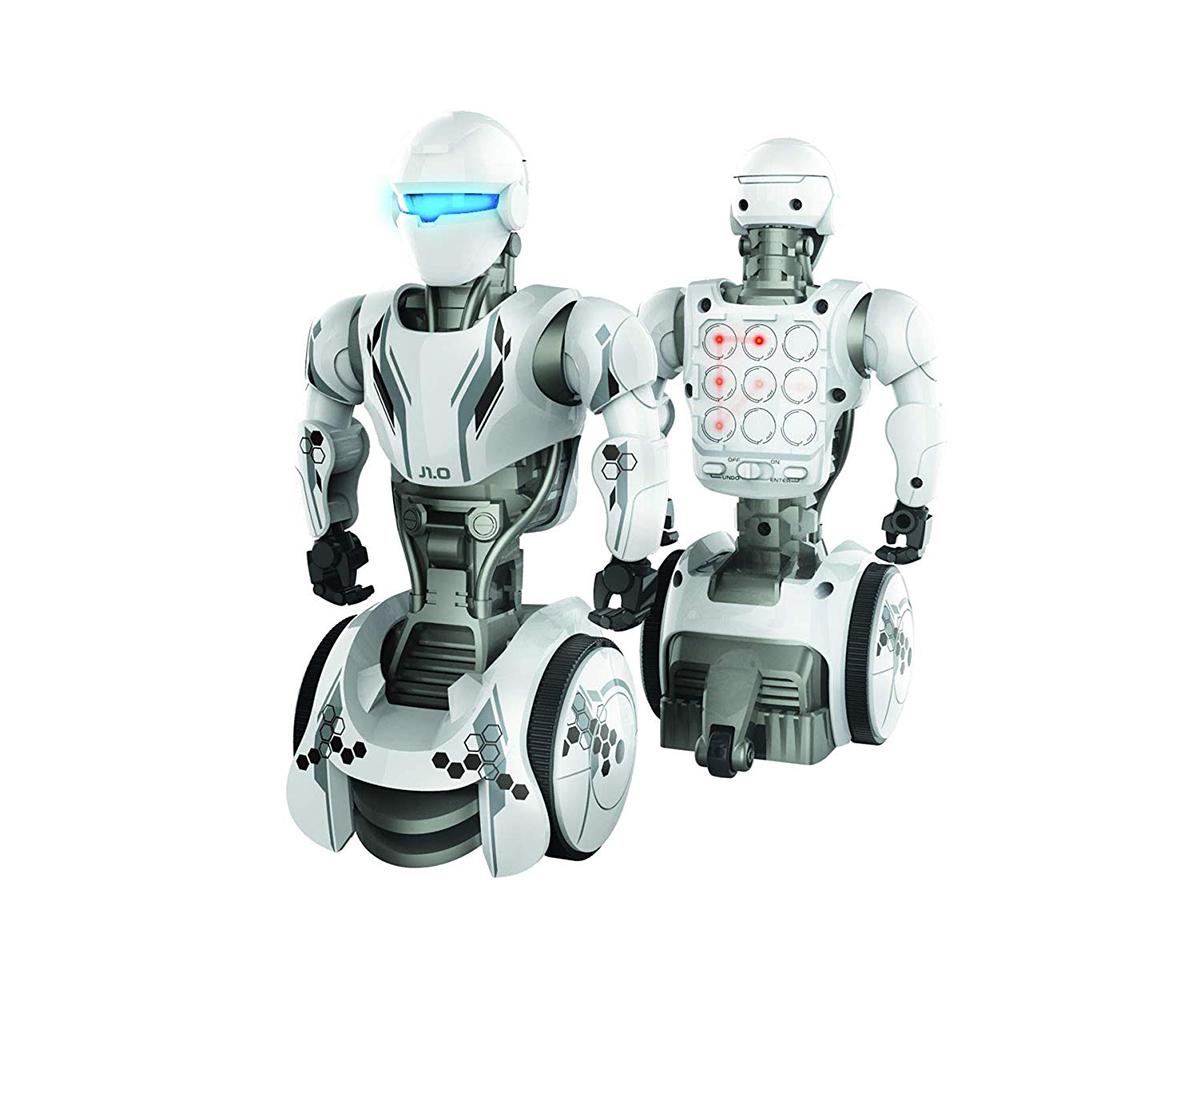 Silverlit | Silverlit Ycoo Junior 1.0 Robot-White Robotics for Kids age 5Y+ (White)